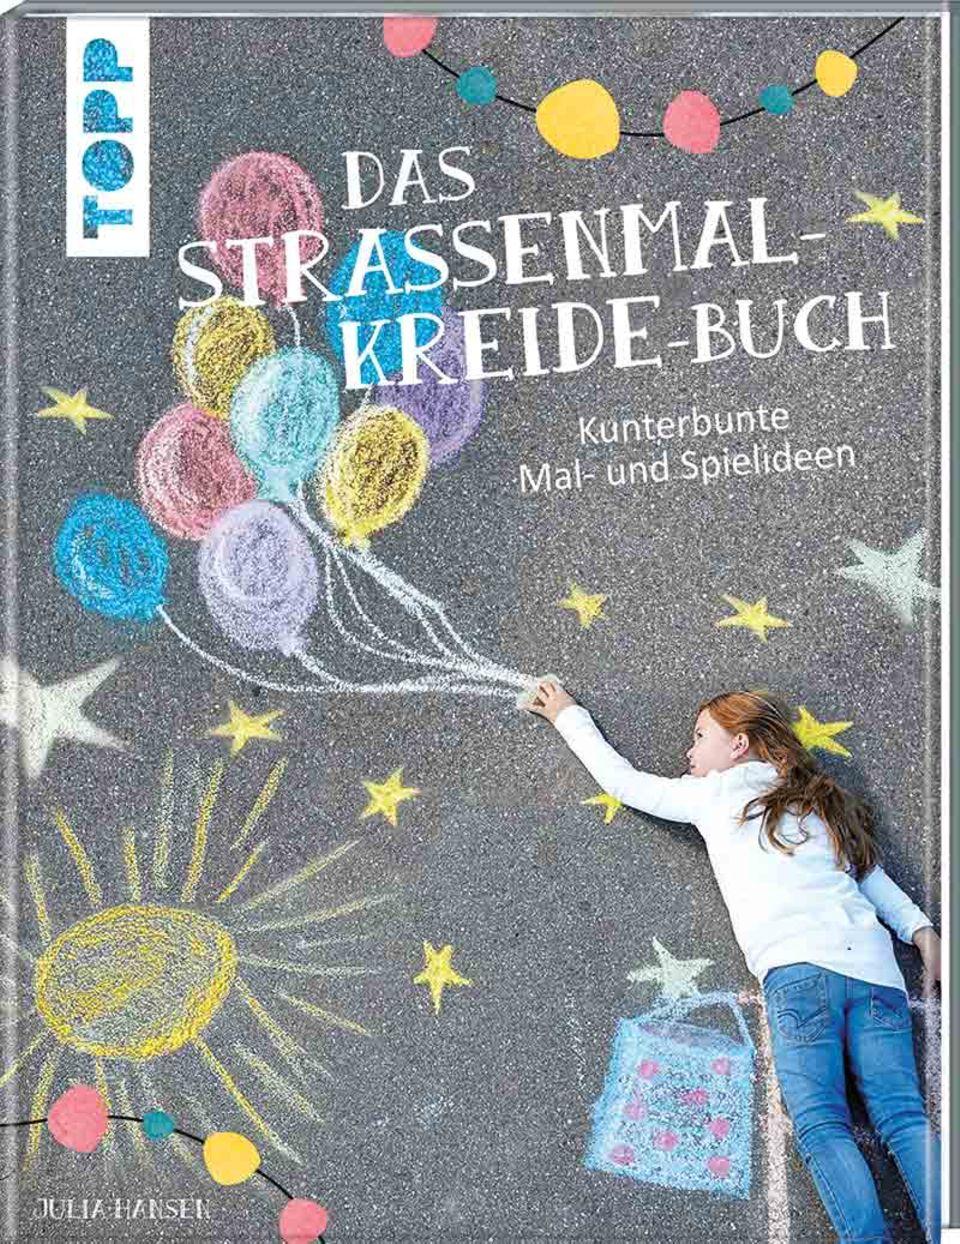 Das Straßenmalkreide-Buch aus dem Frechverlag/TOPP